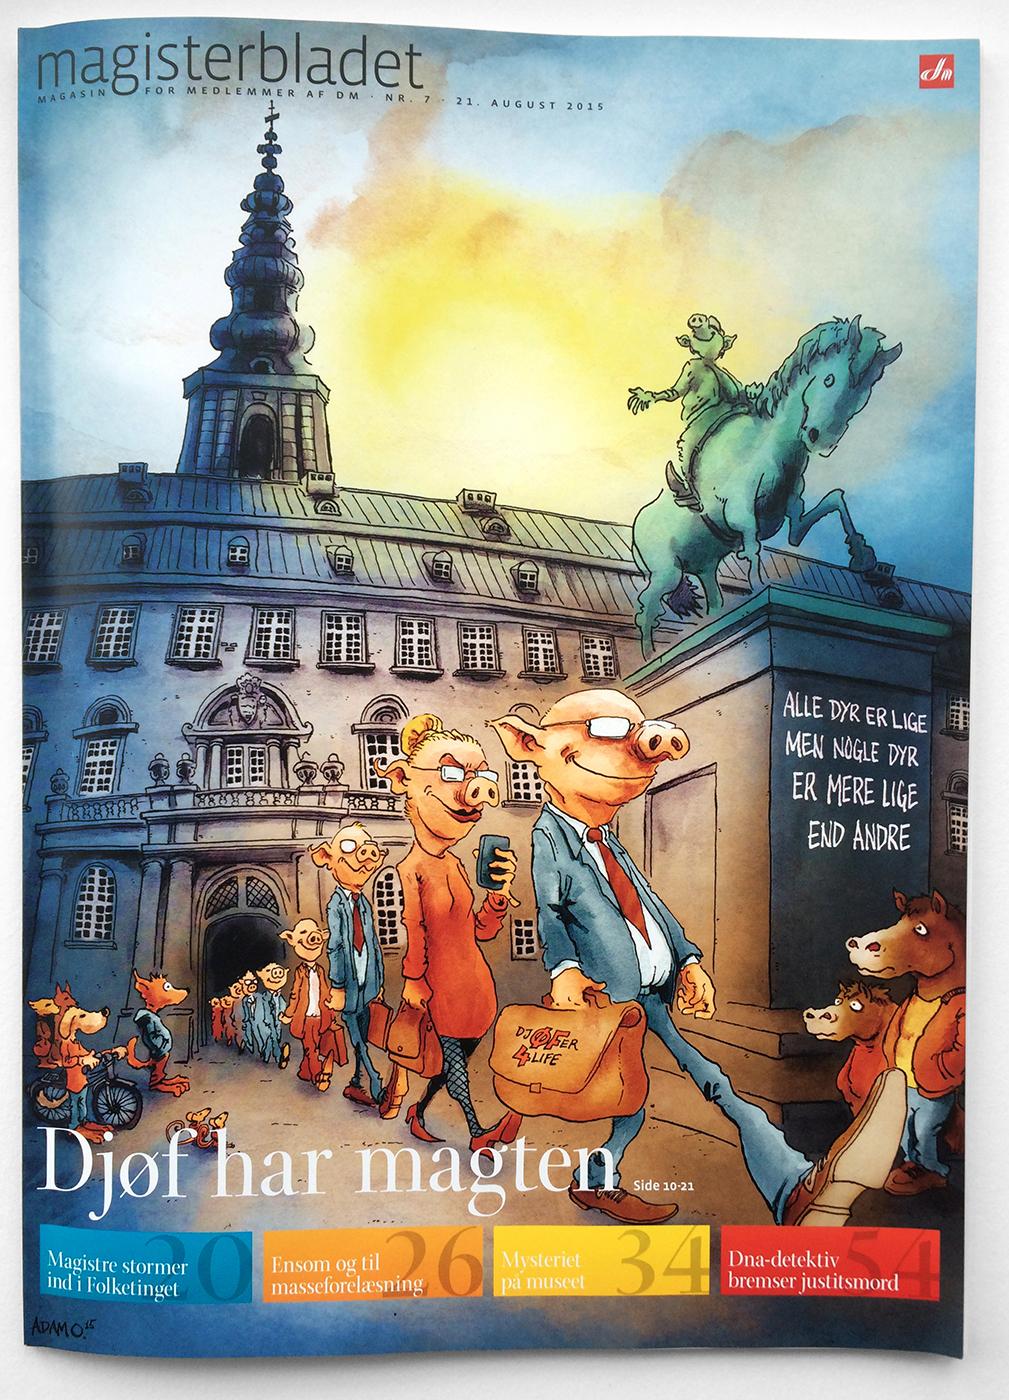 Magisterbladet